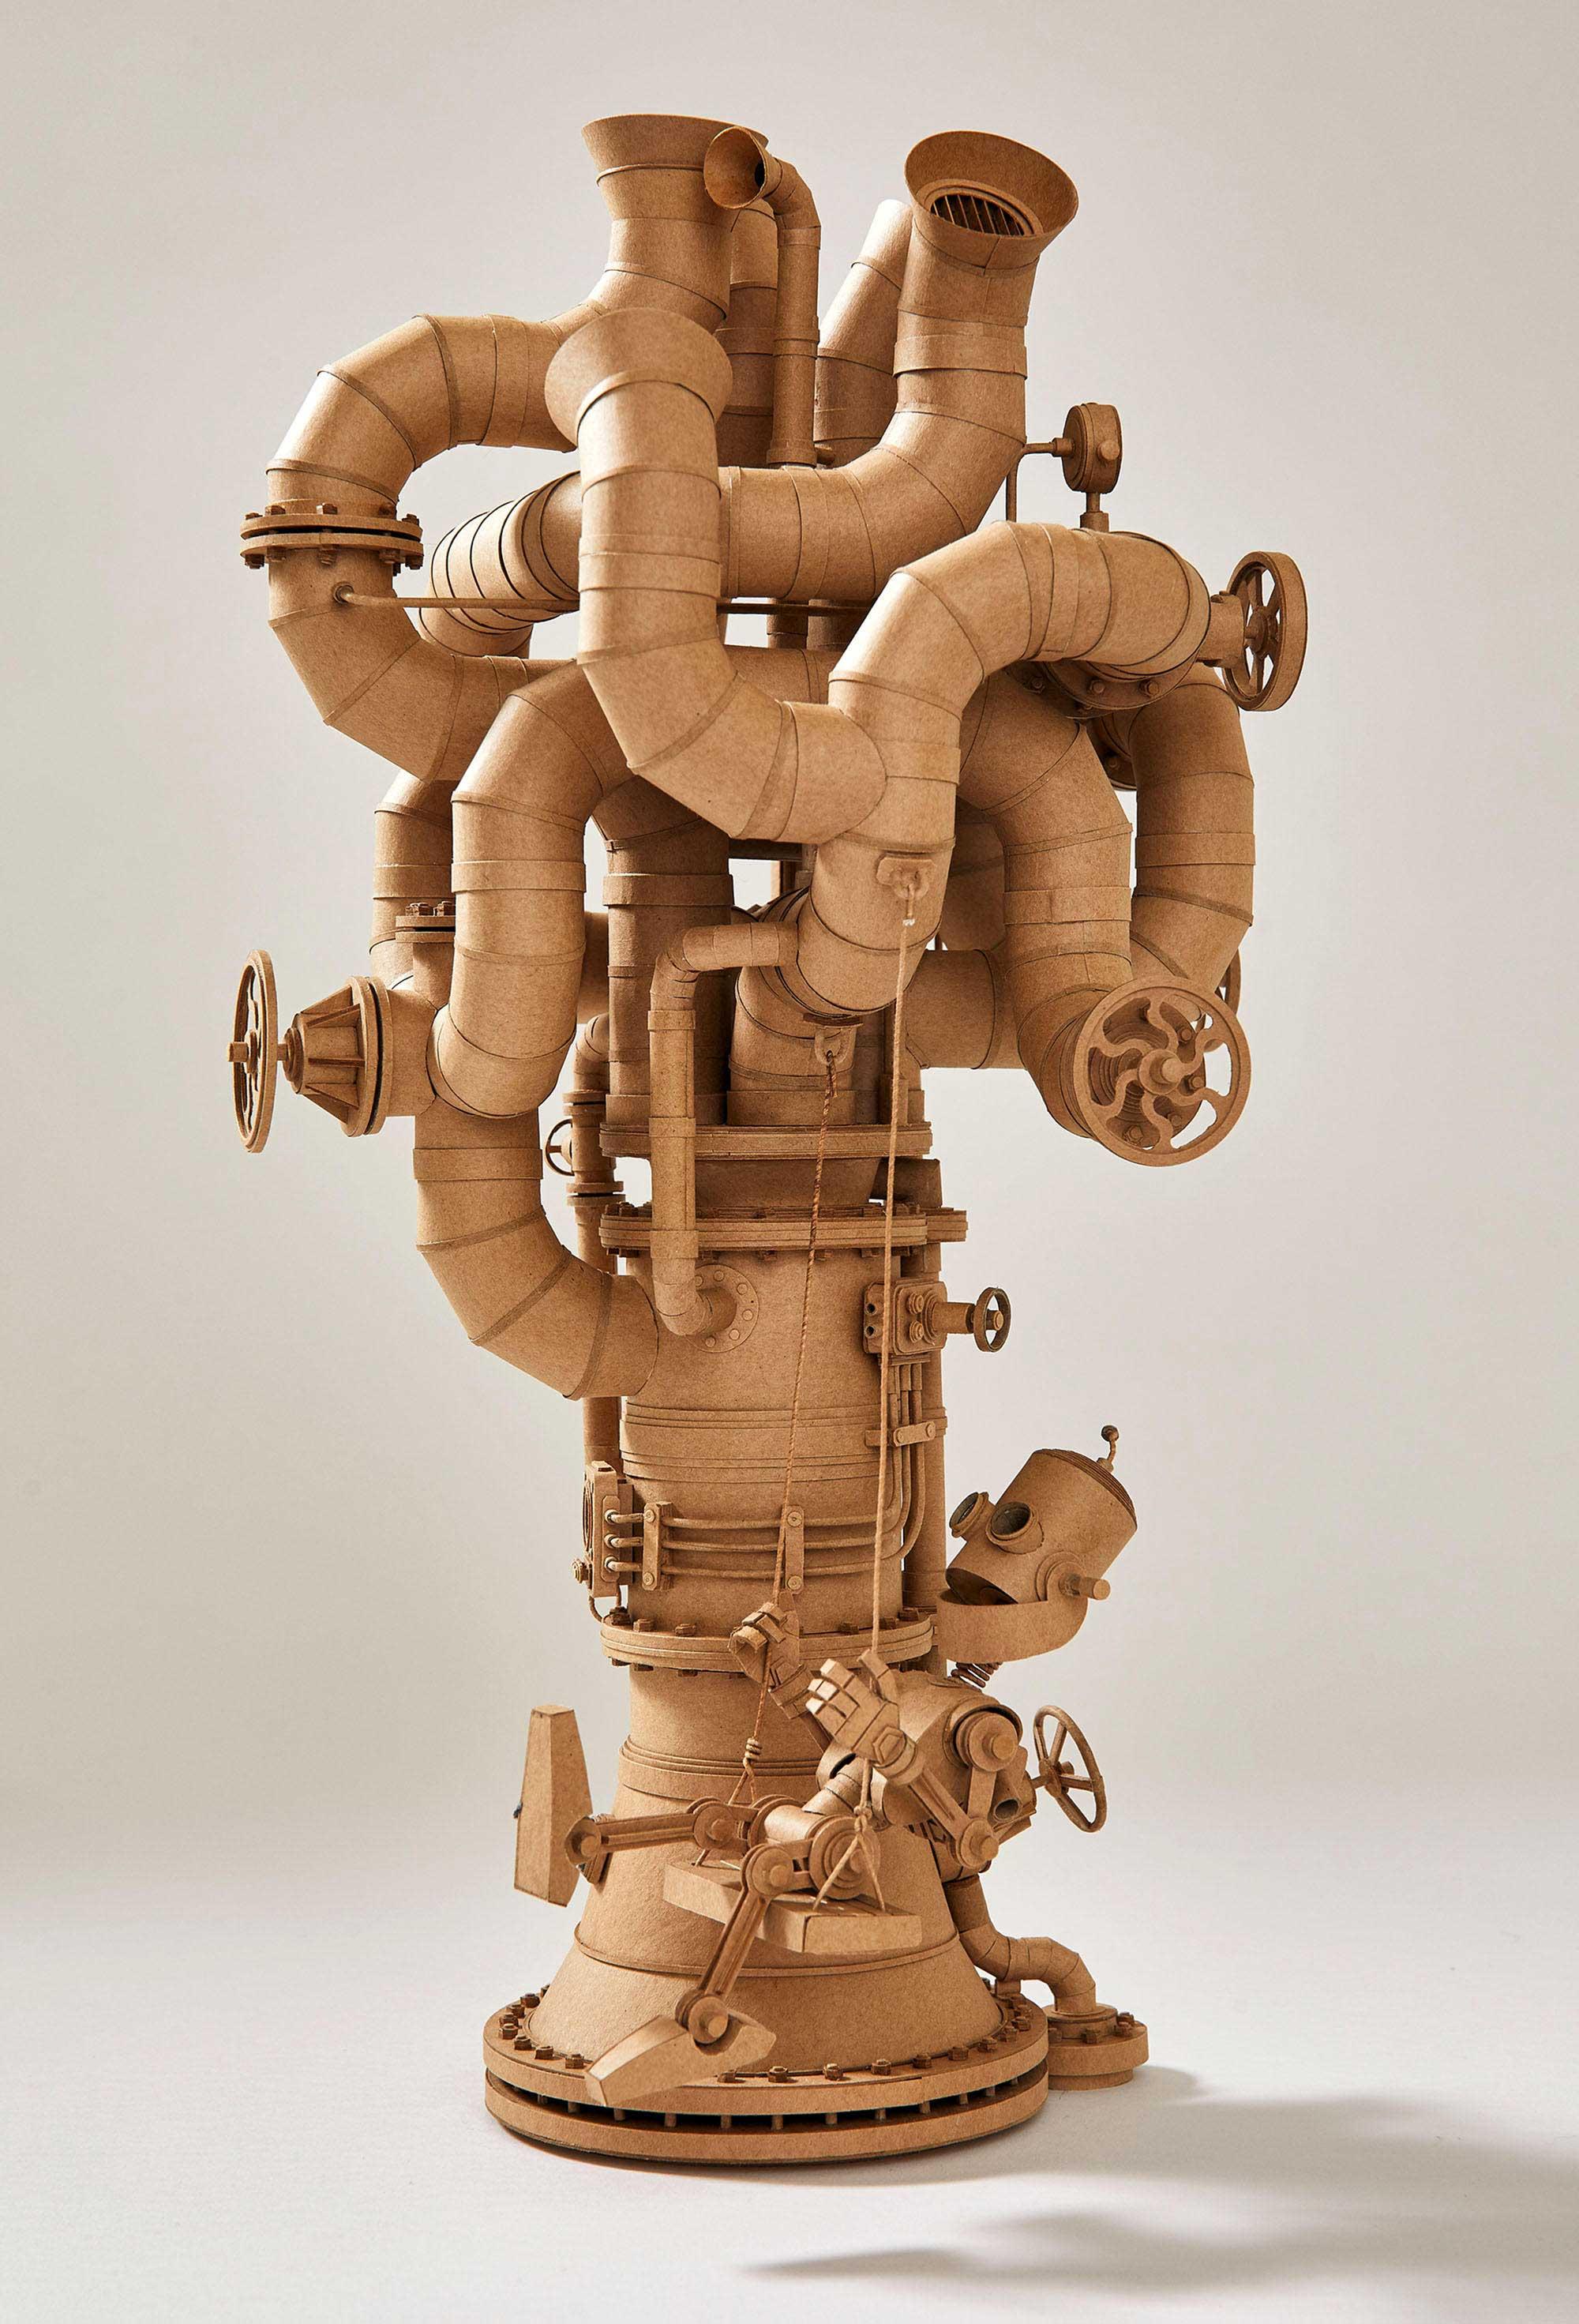 Papp-Steampunk-Roboter von Greg Olijnyk papproboter-Greg-Olijnyk_04